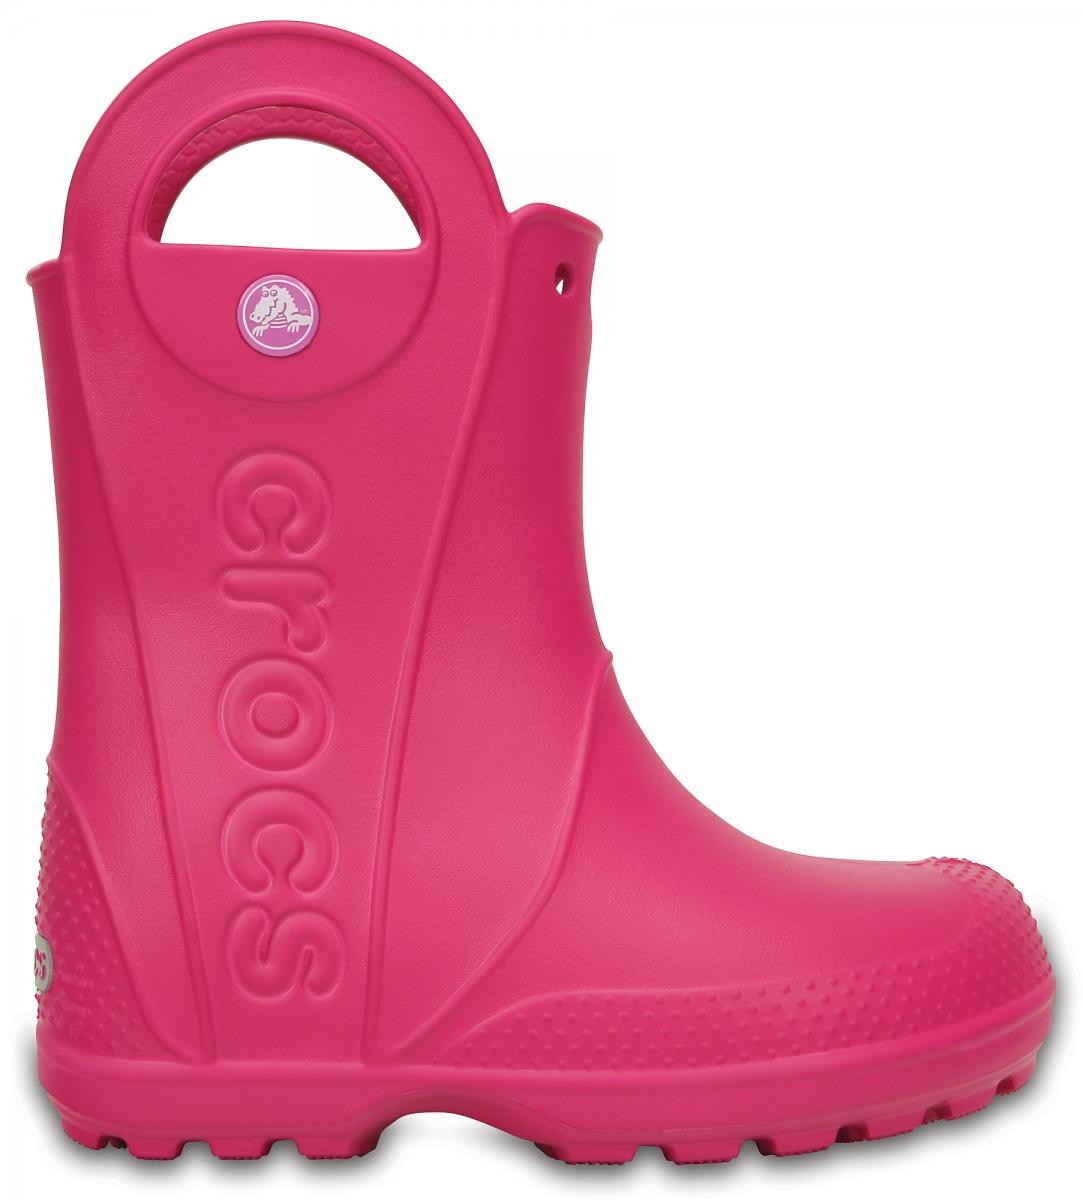 Crocs Handle It Rain Boot Kids - Candy Pink, C9 (25-26)